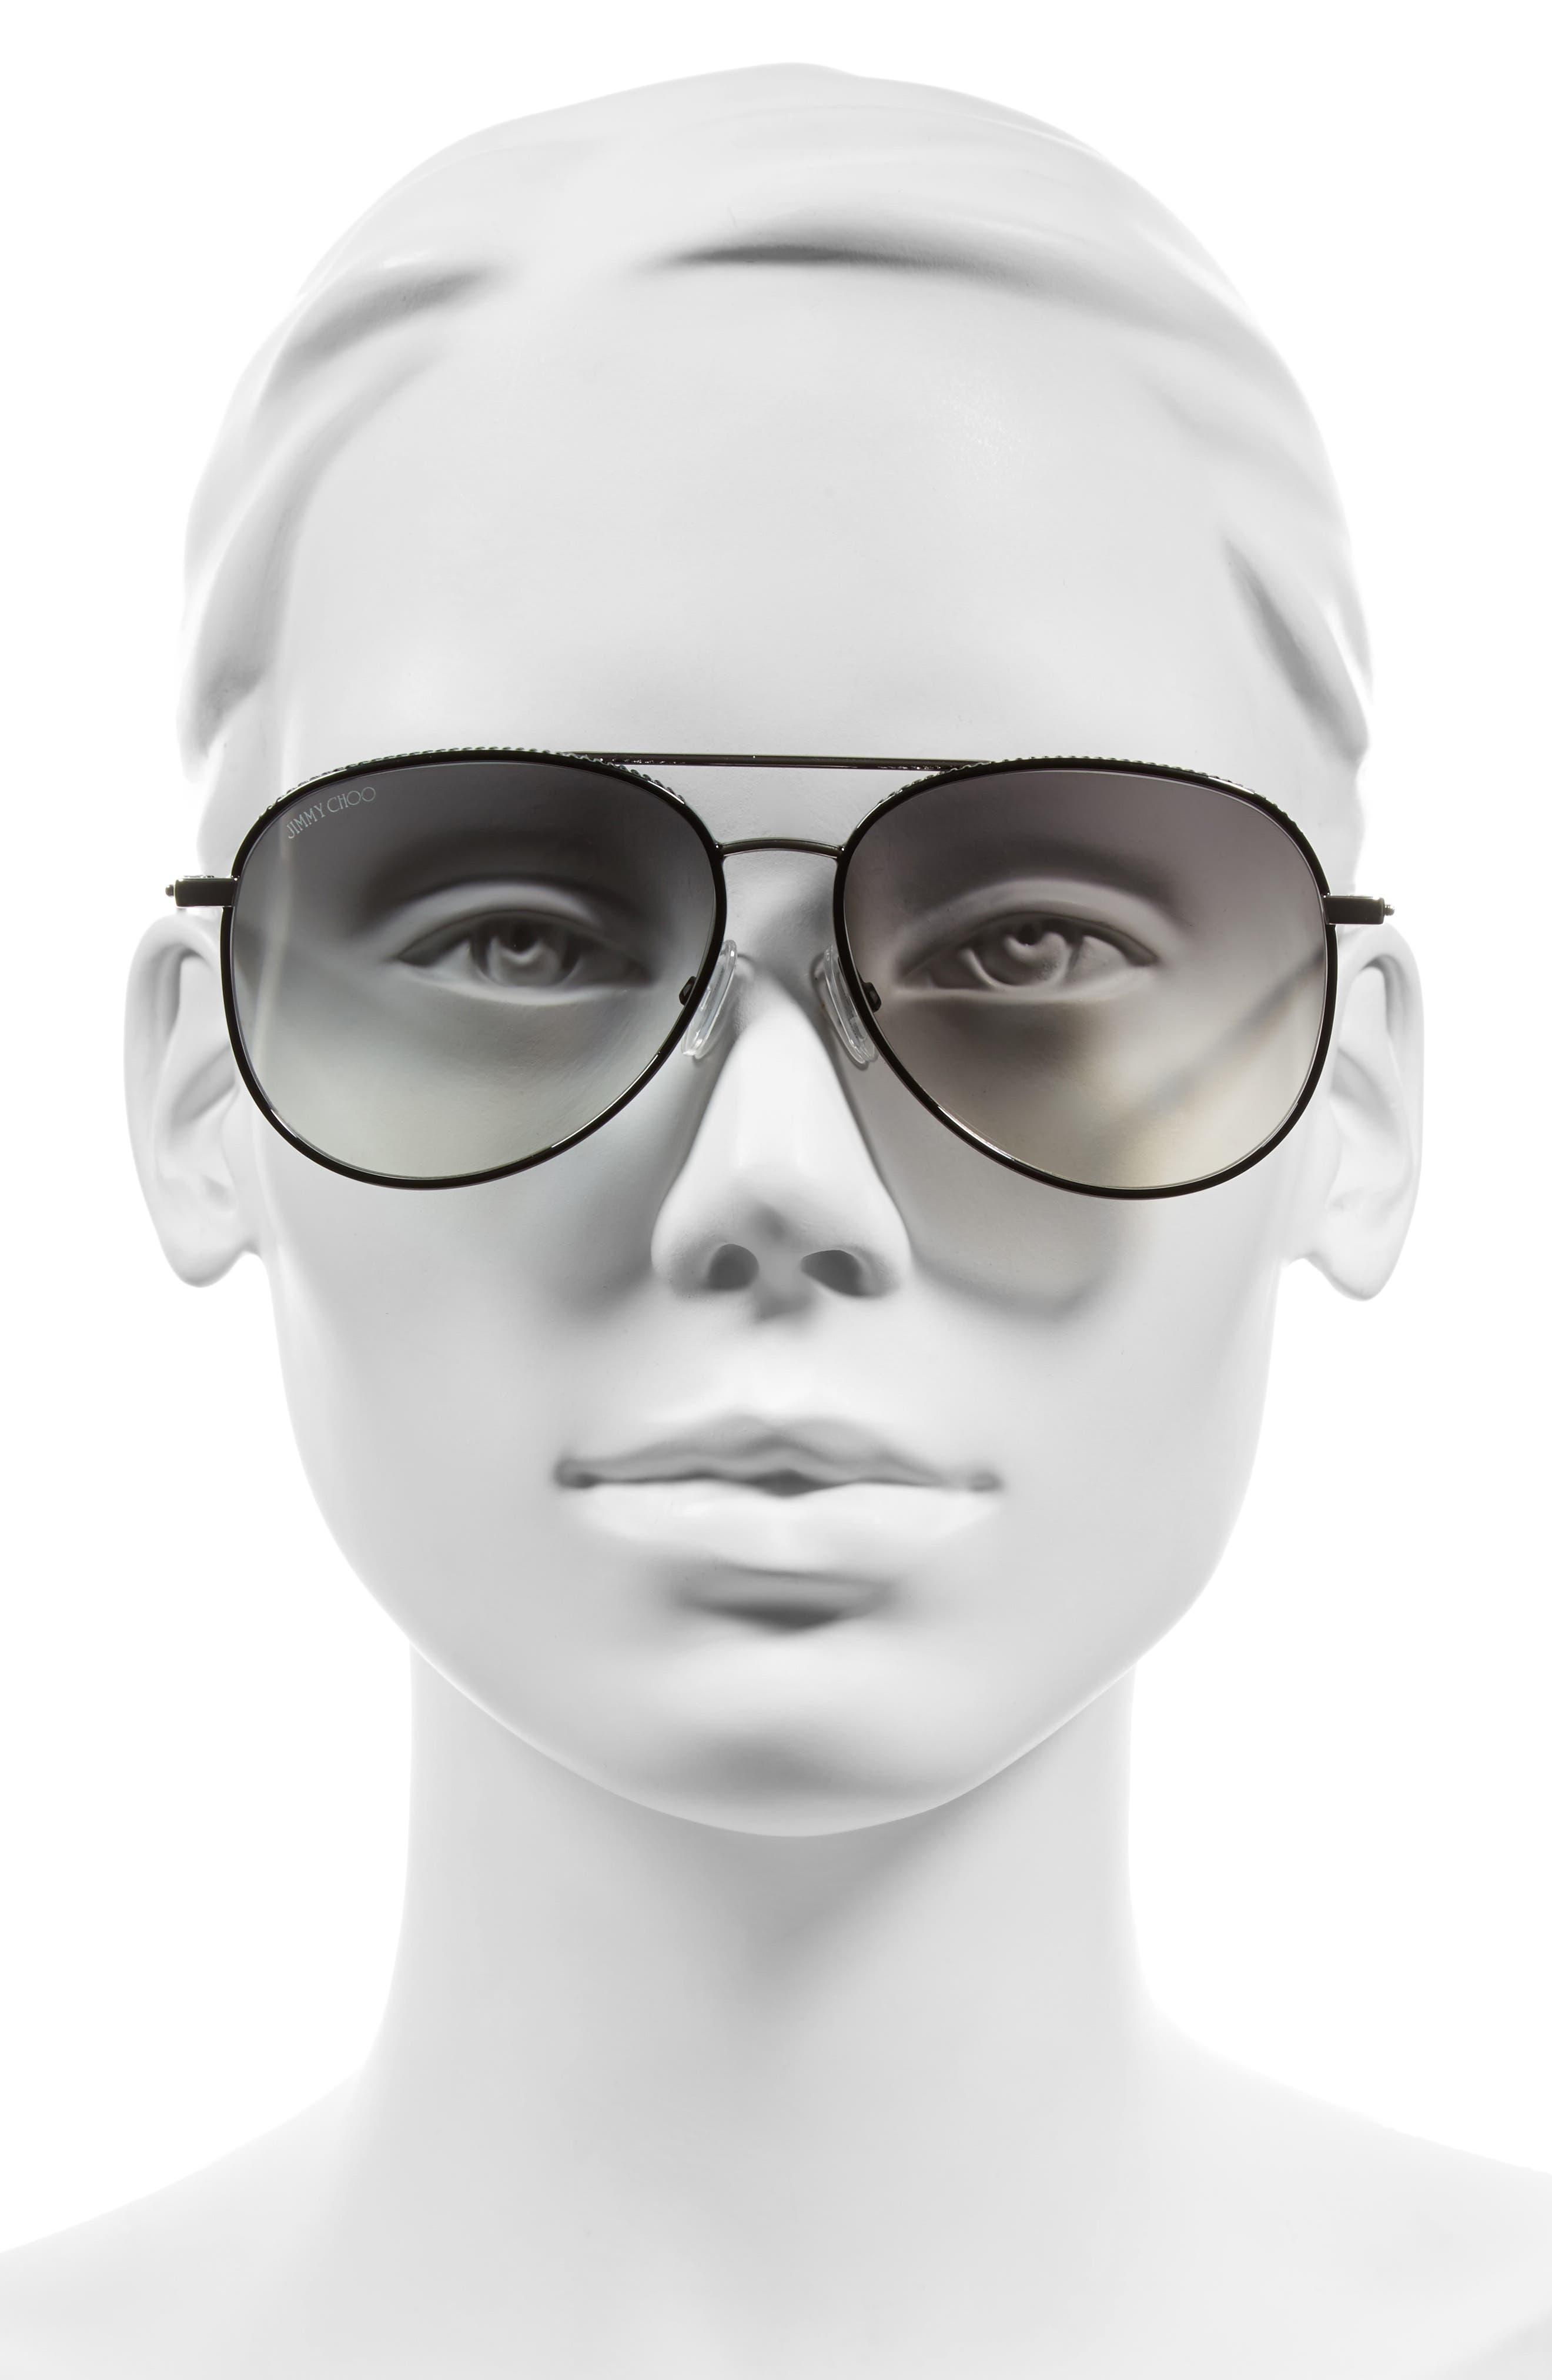 Reto 57mm Sunglasses,                             Alternate thumbnail 2, color,                             SHINY BLACK/ GREY SILVER